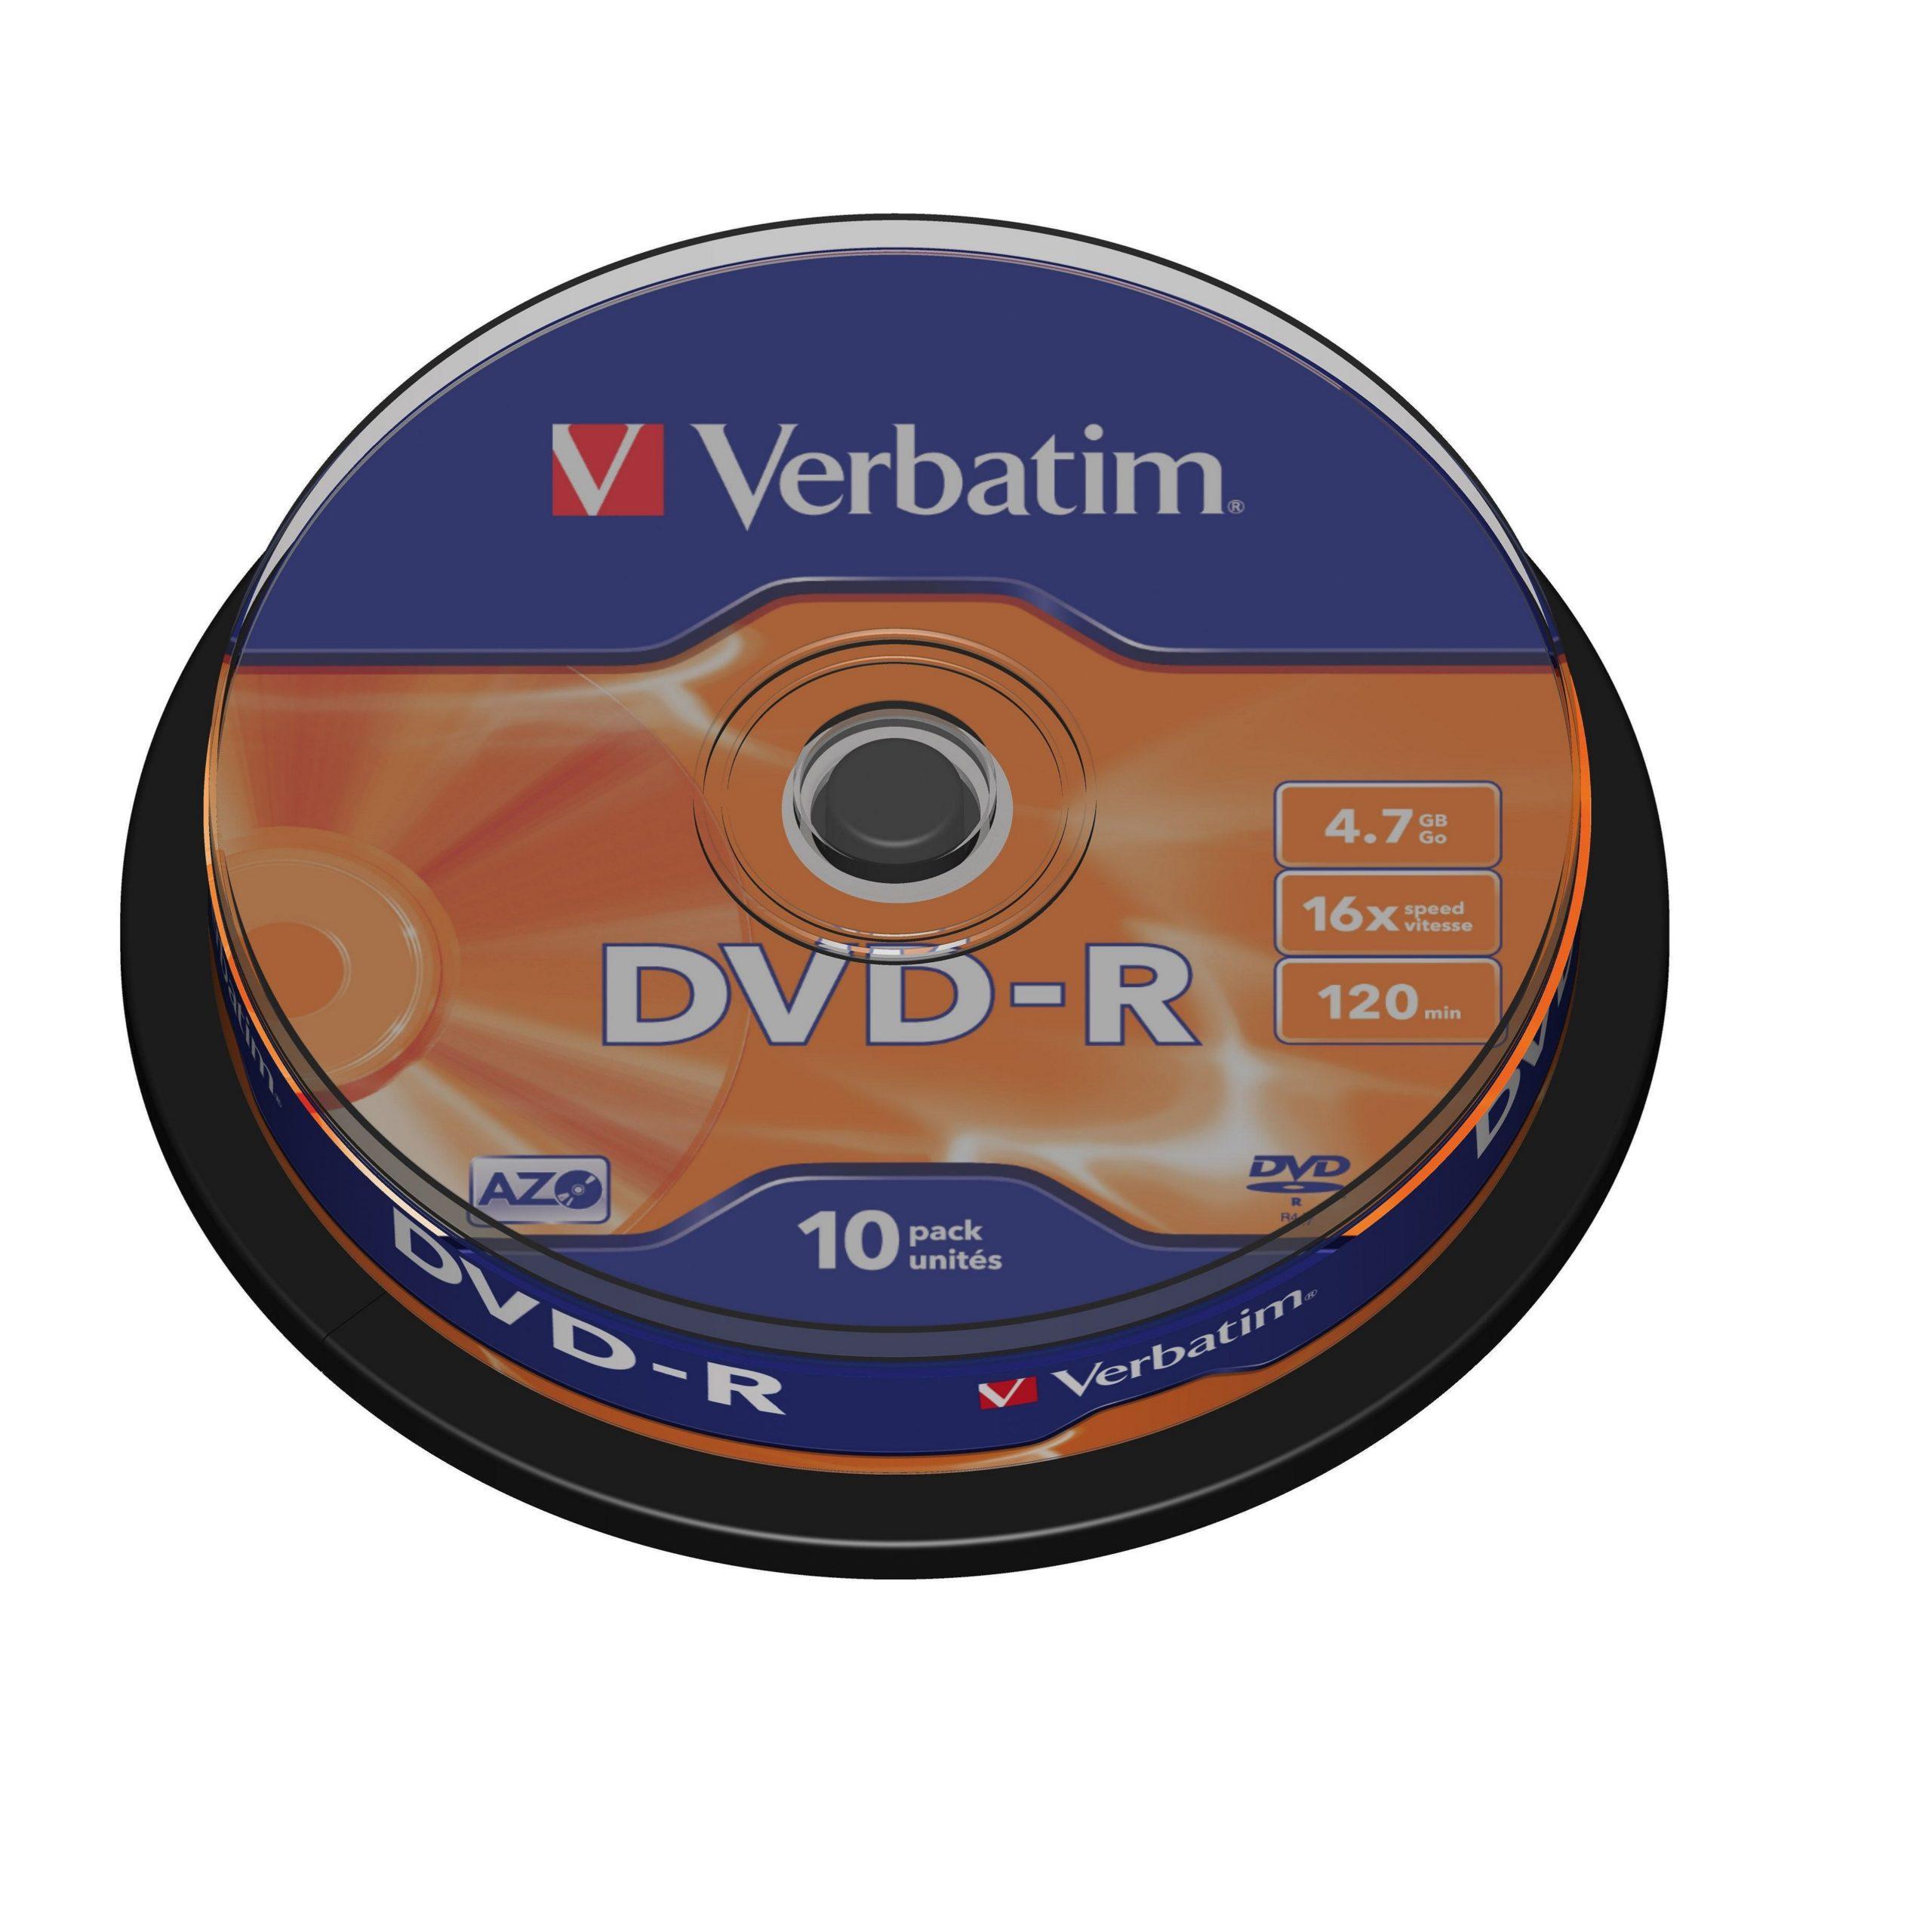 DVD-R VERBATIM 10 PACK